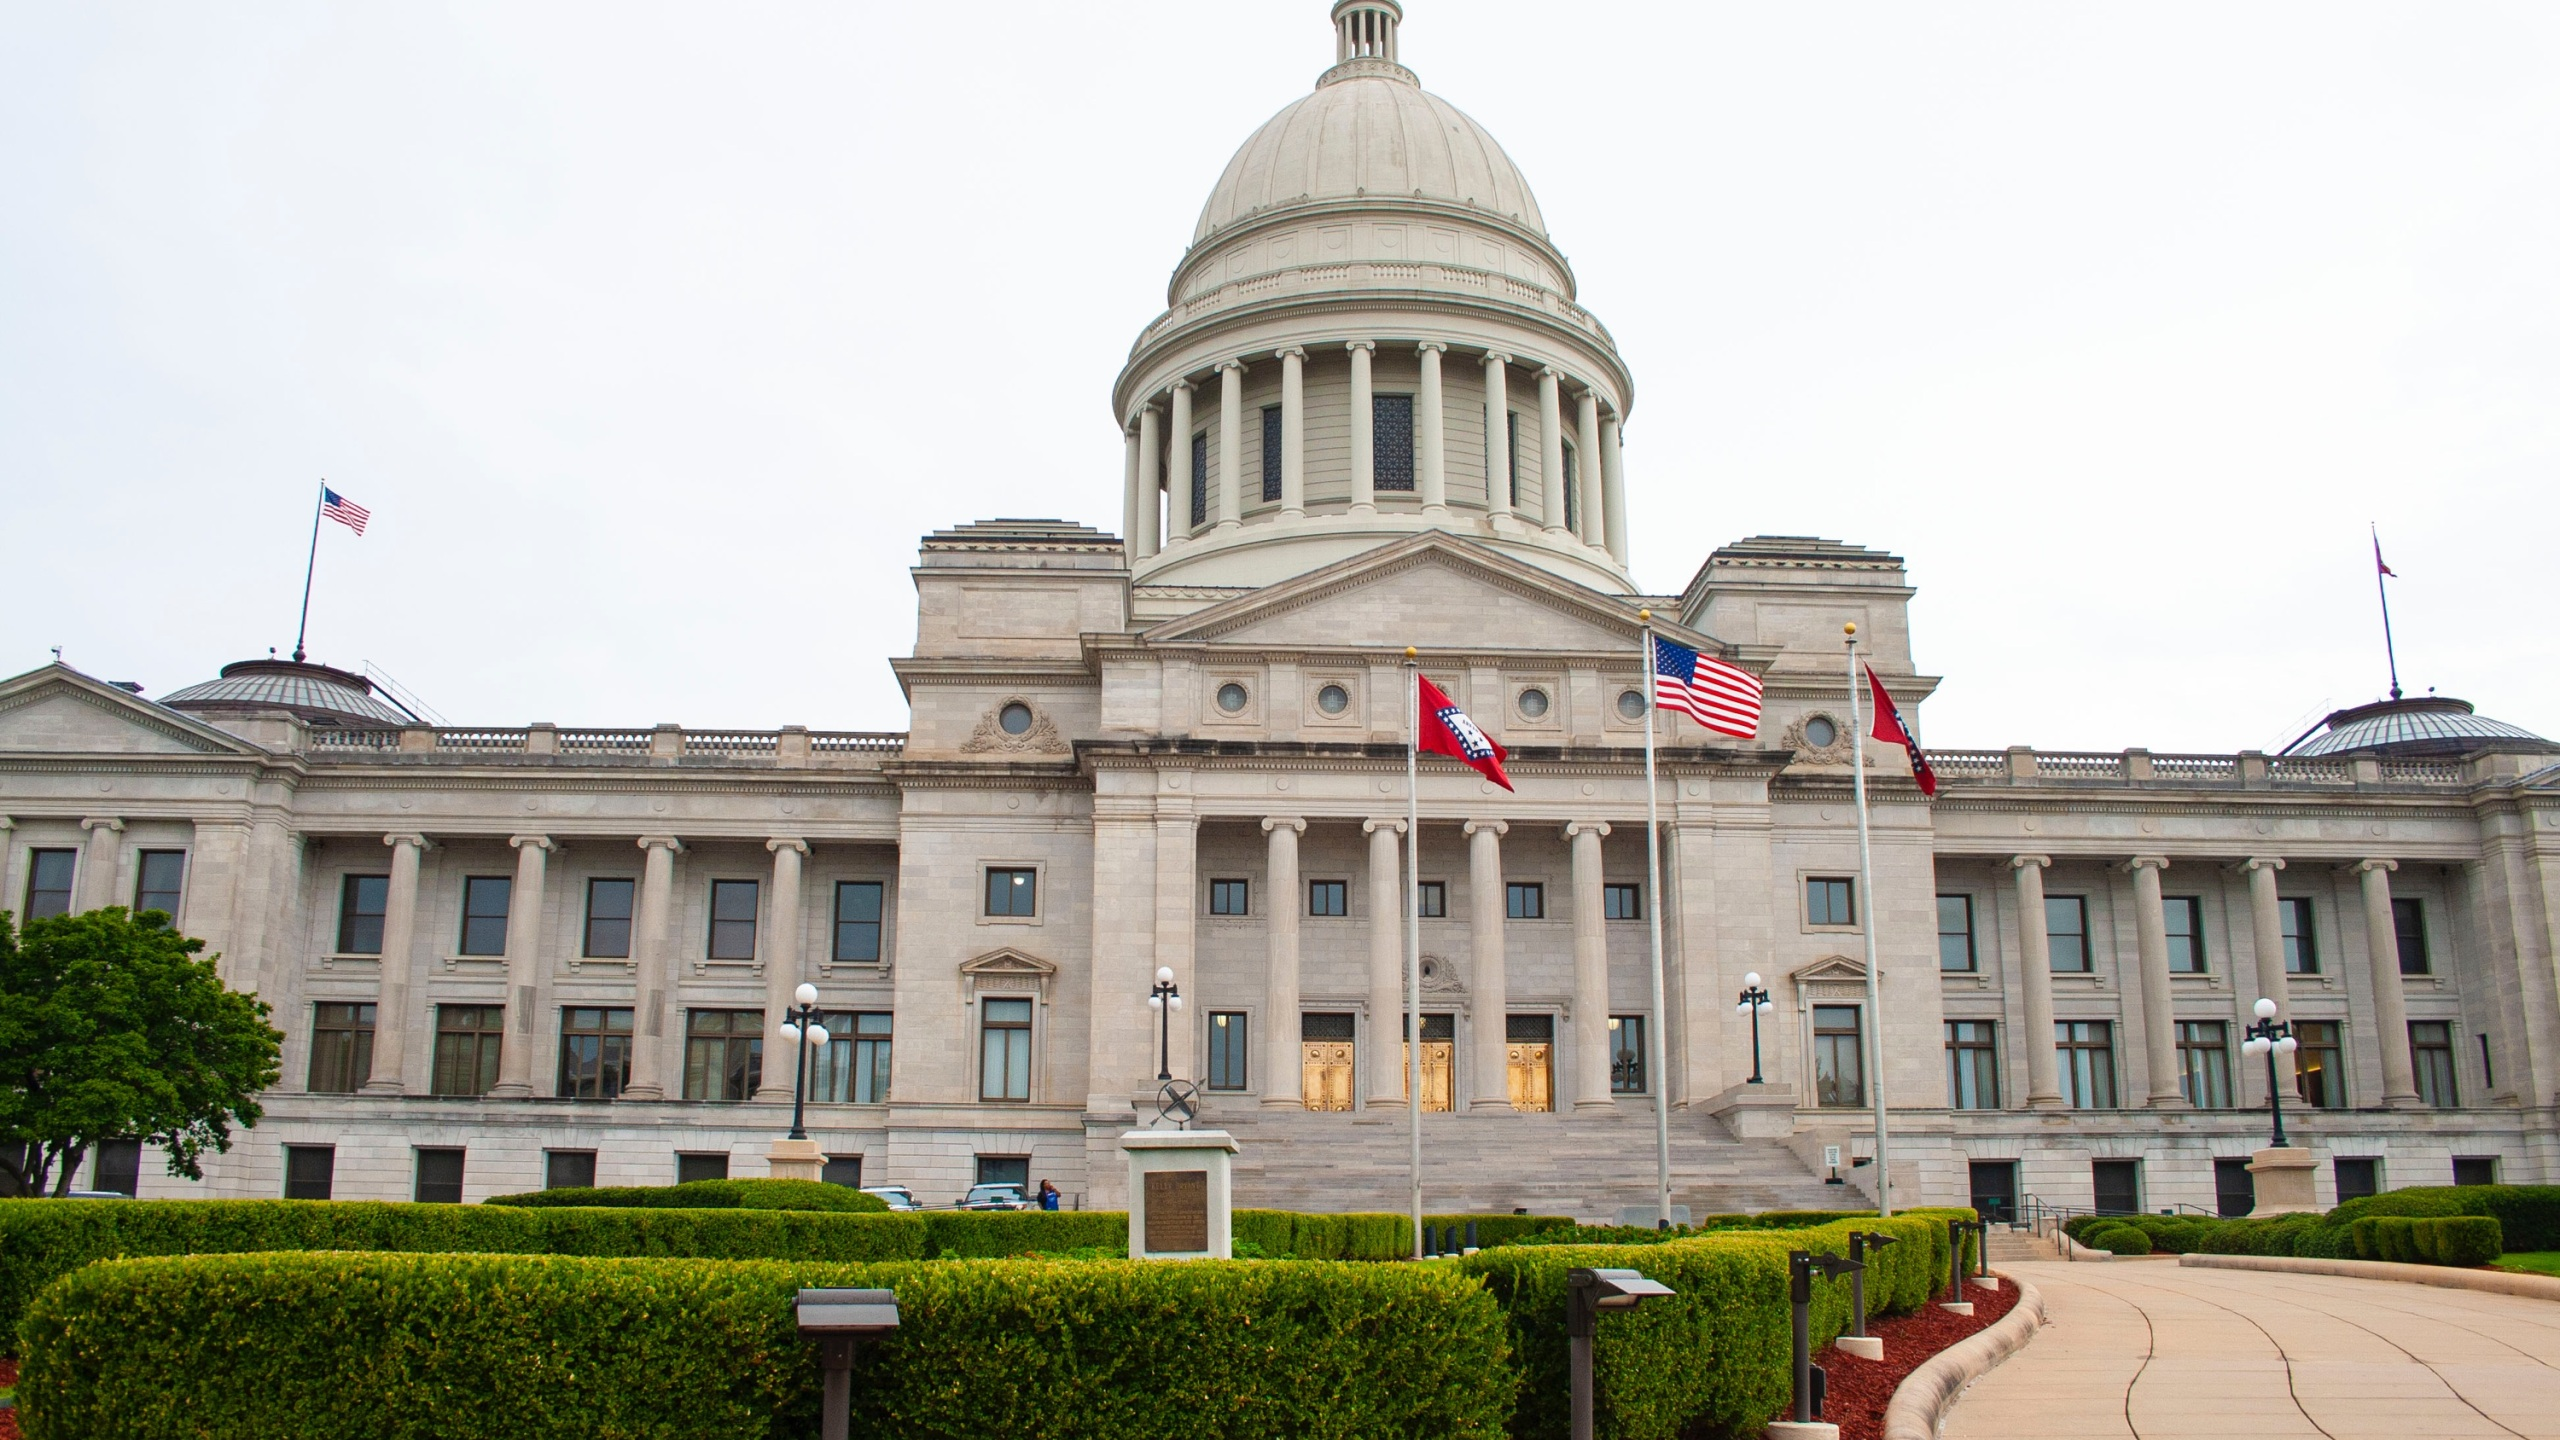 Arkansas_State_Capitol_in_Summer_1550242965377.jpg